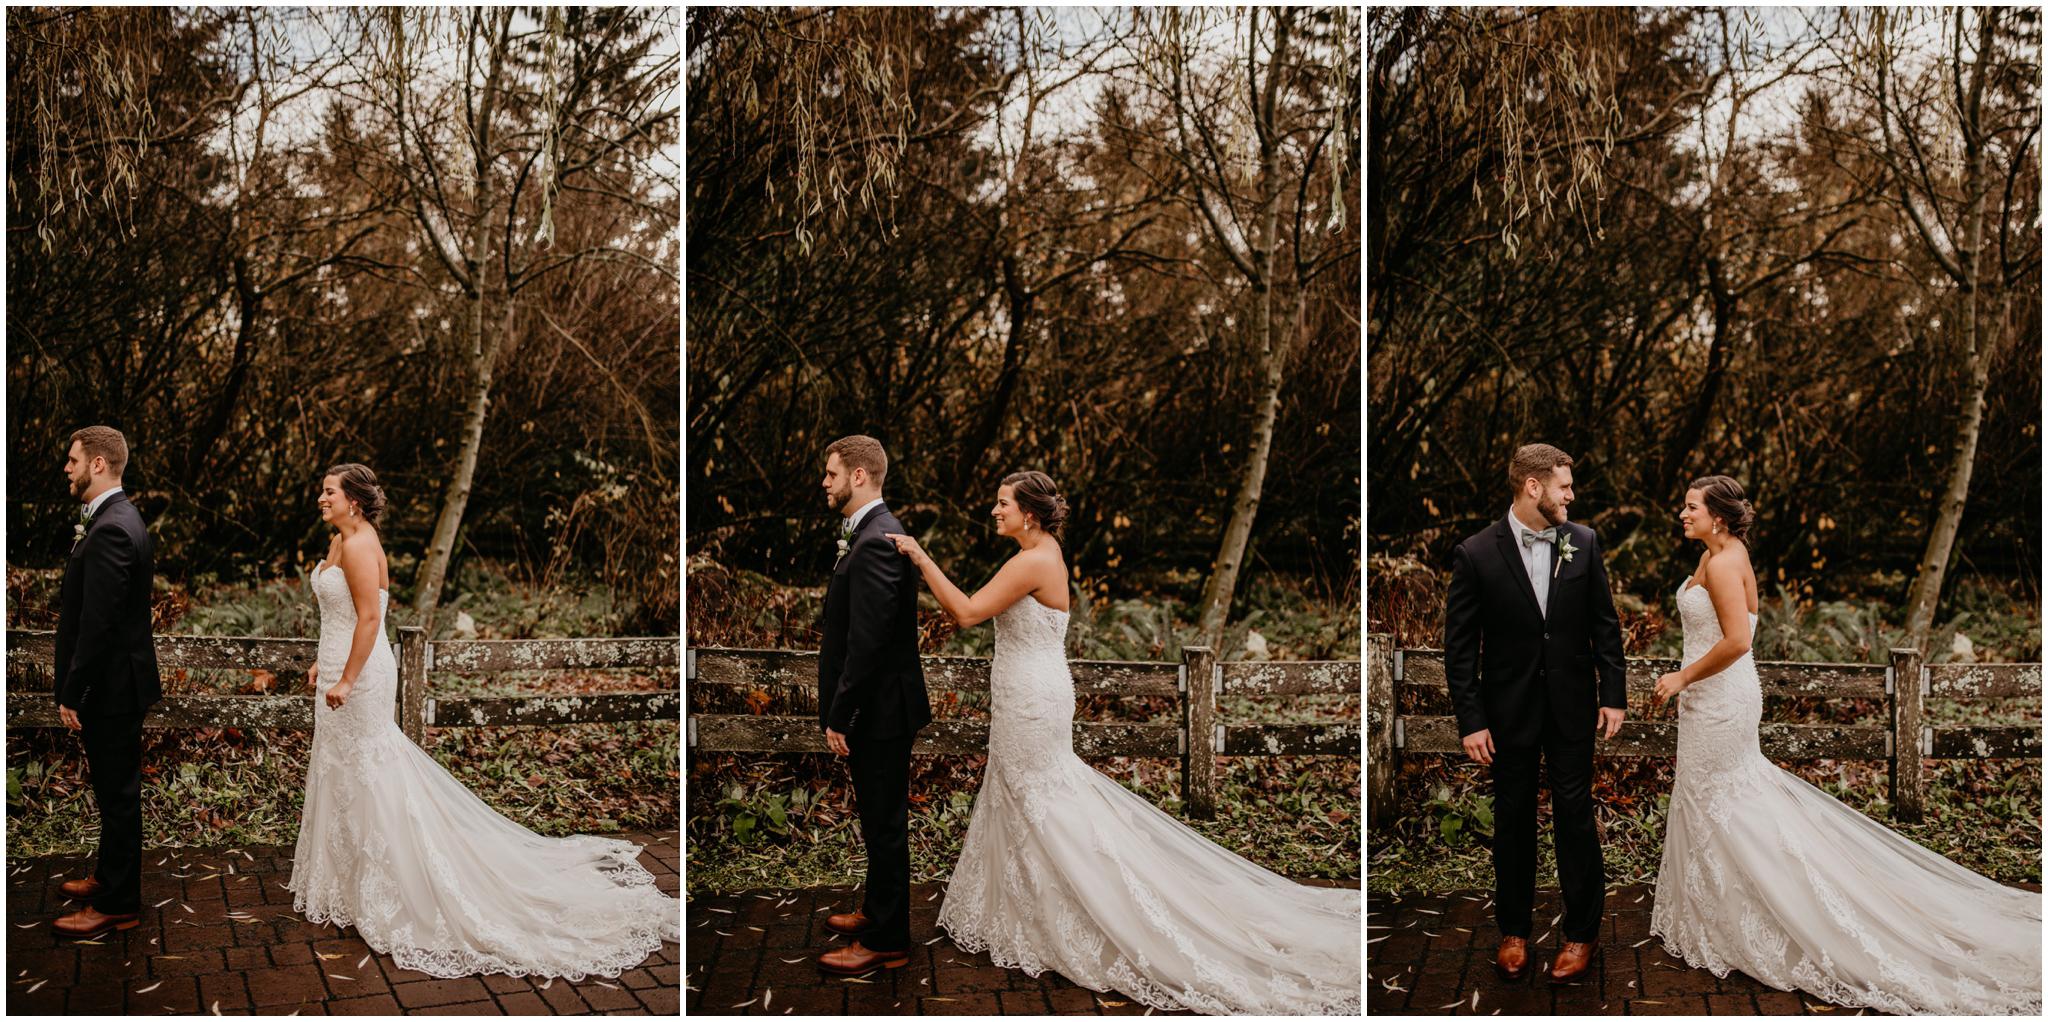 ashley-tj-the-pickering-barn-winter-wedding-seattle-photographer-020.jpg